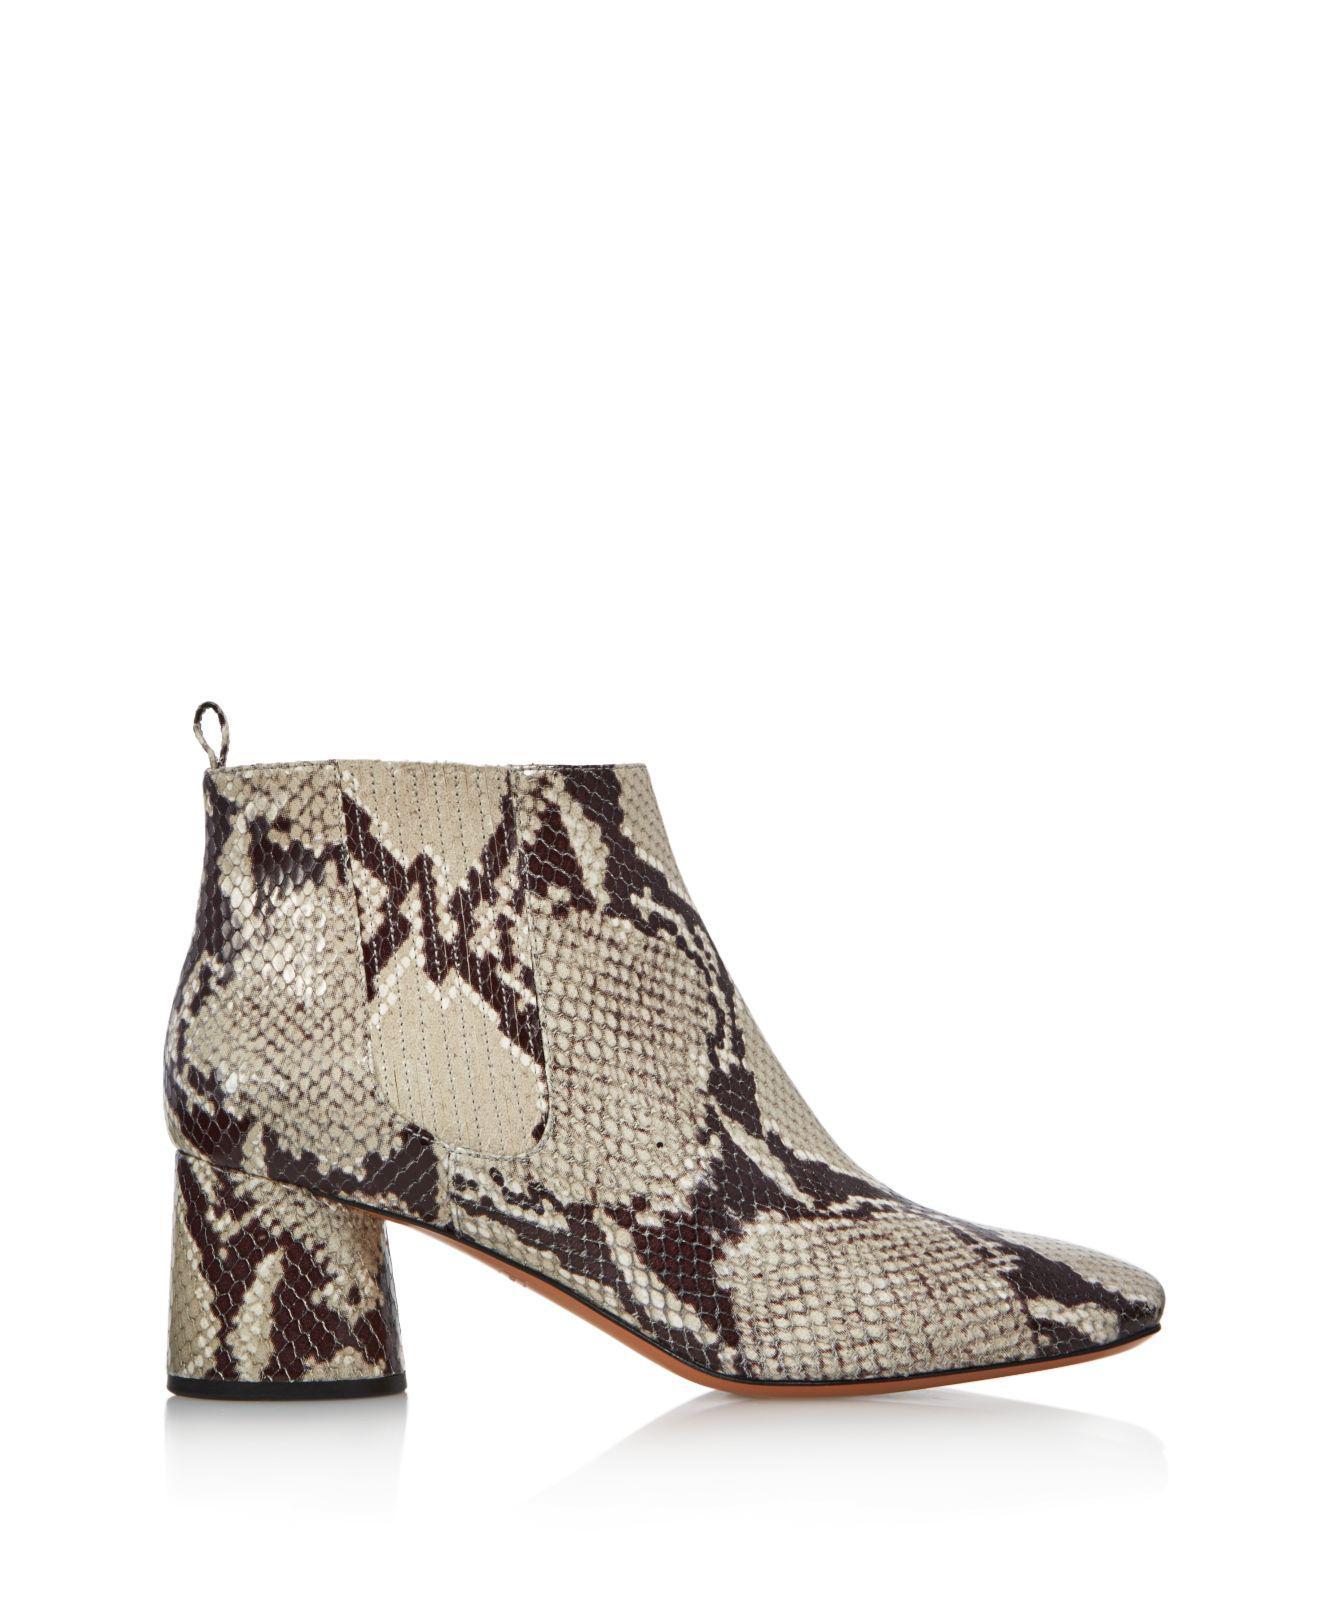 Marc Jacobs Women's Rocket Snake-Embossed Leather Round Block Heel Chelsea Booties lUlLd